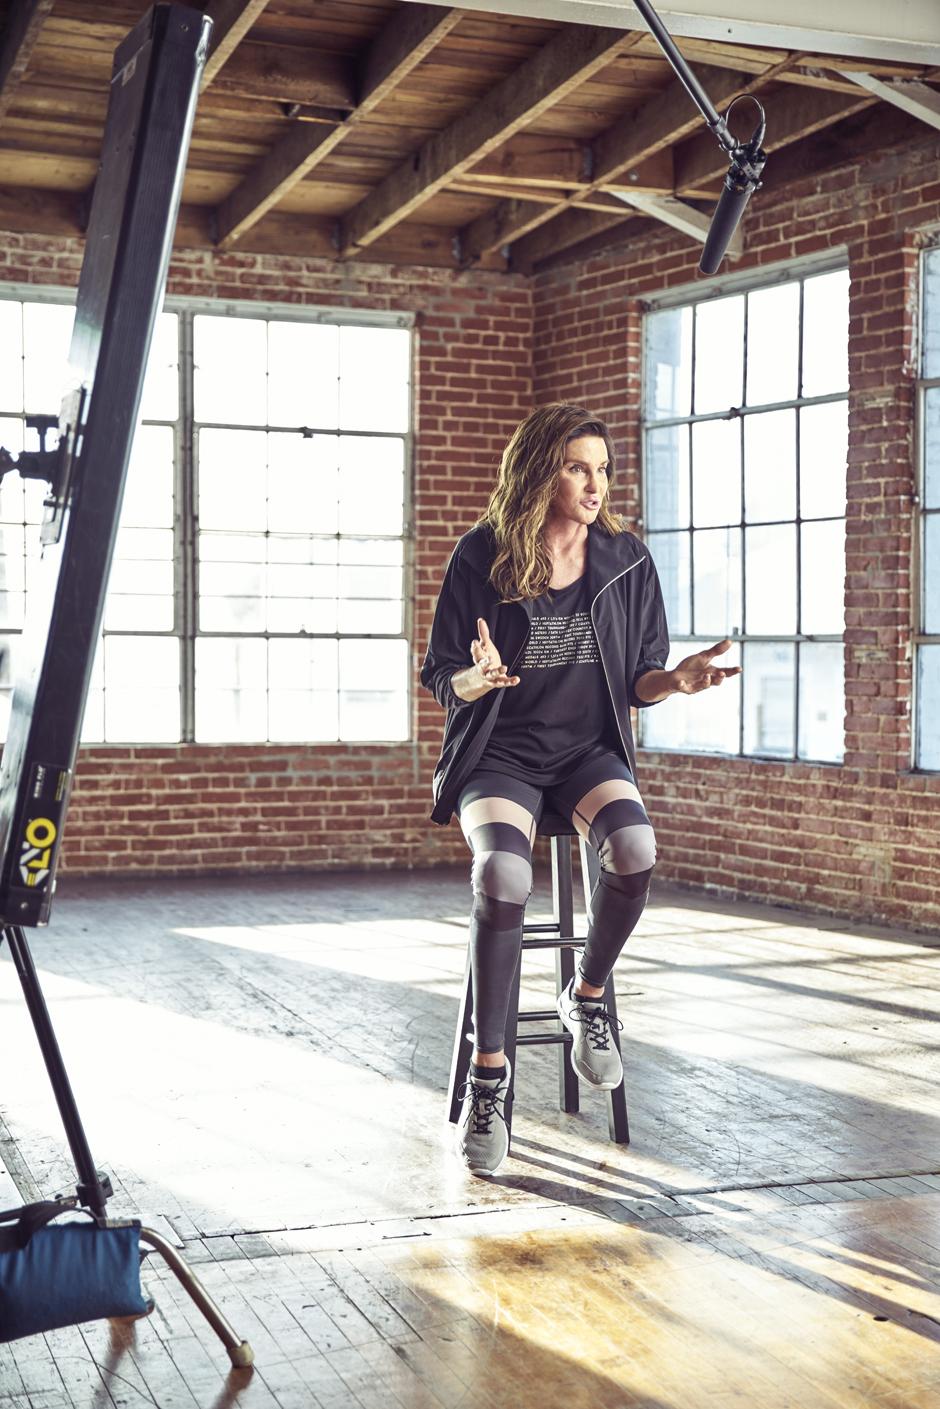 Кейтлин Дженнер в рекламной кампании H&M For Every Victory